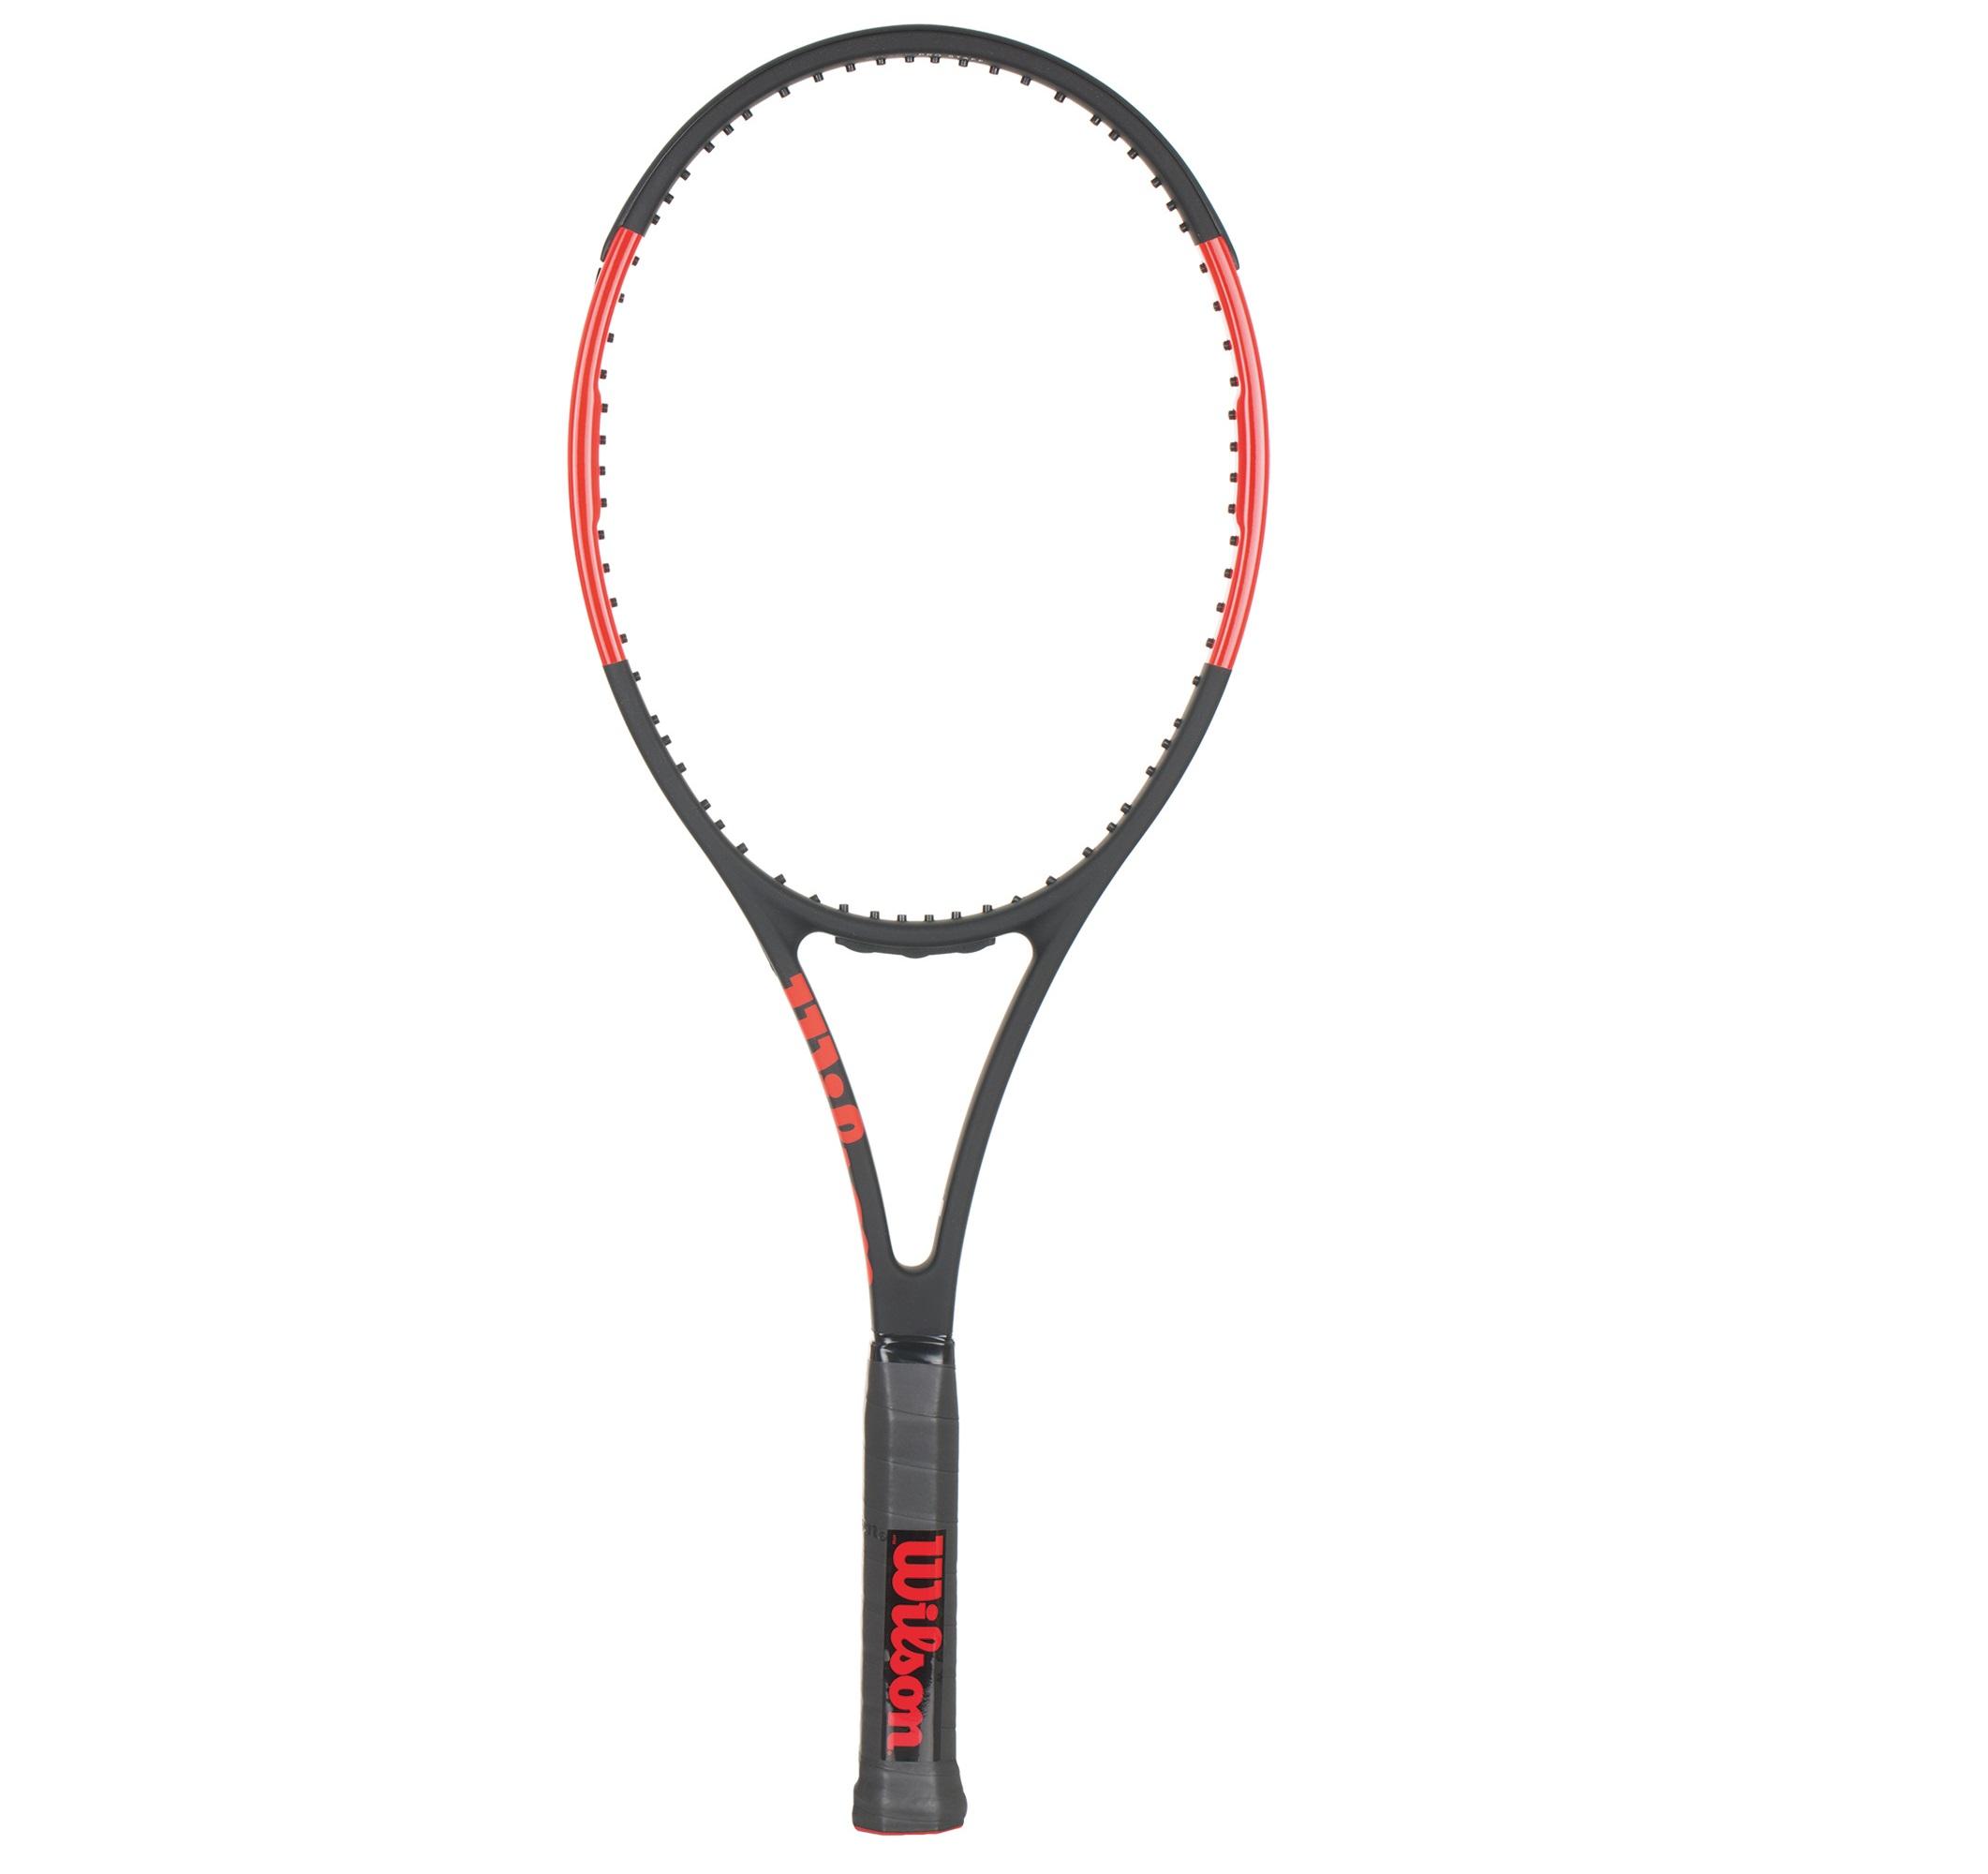 Wilson Ракетка для большого тенниса Pro Staff 97